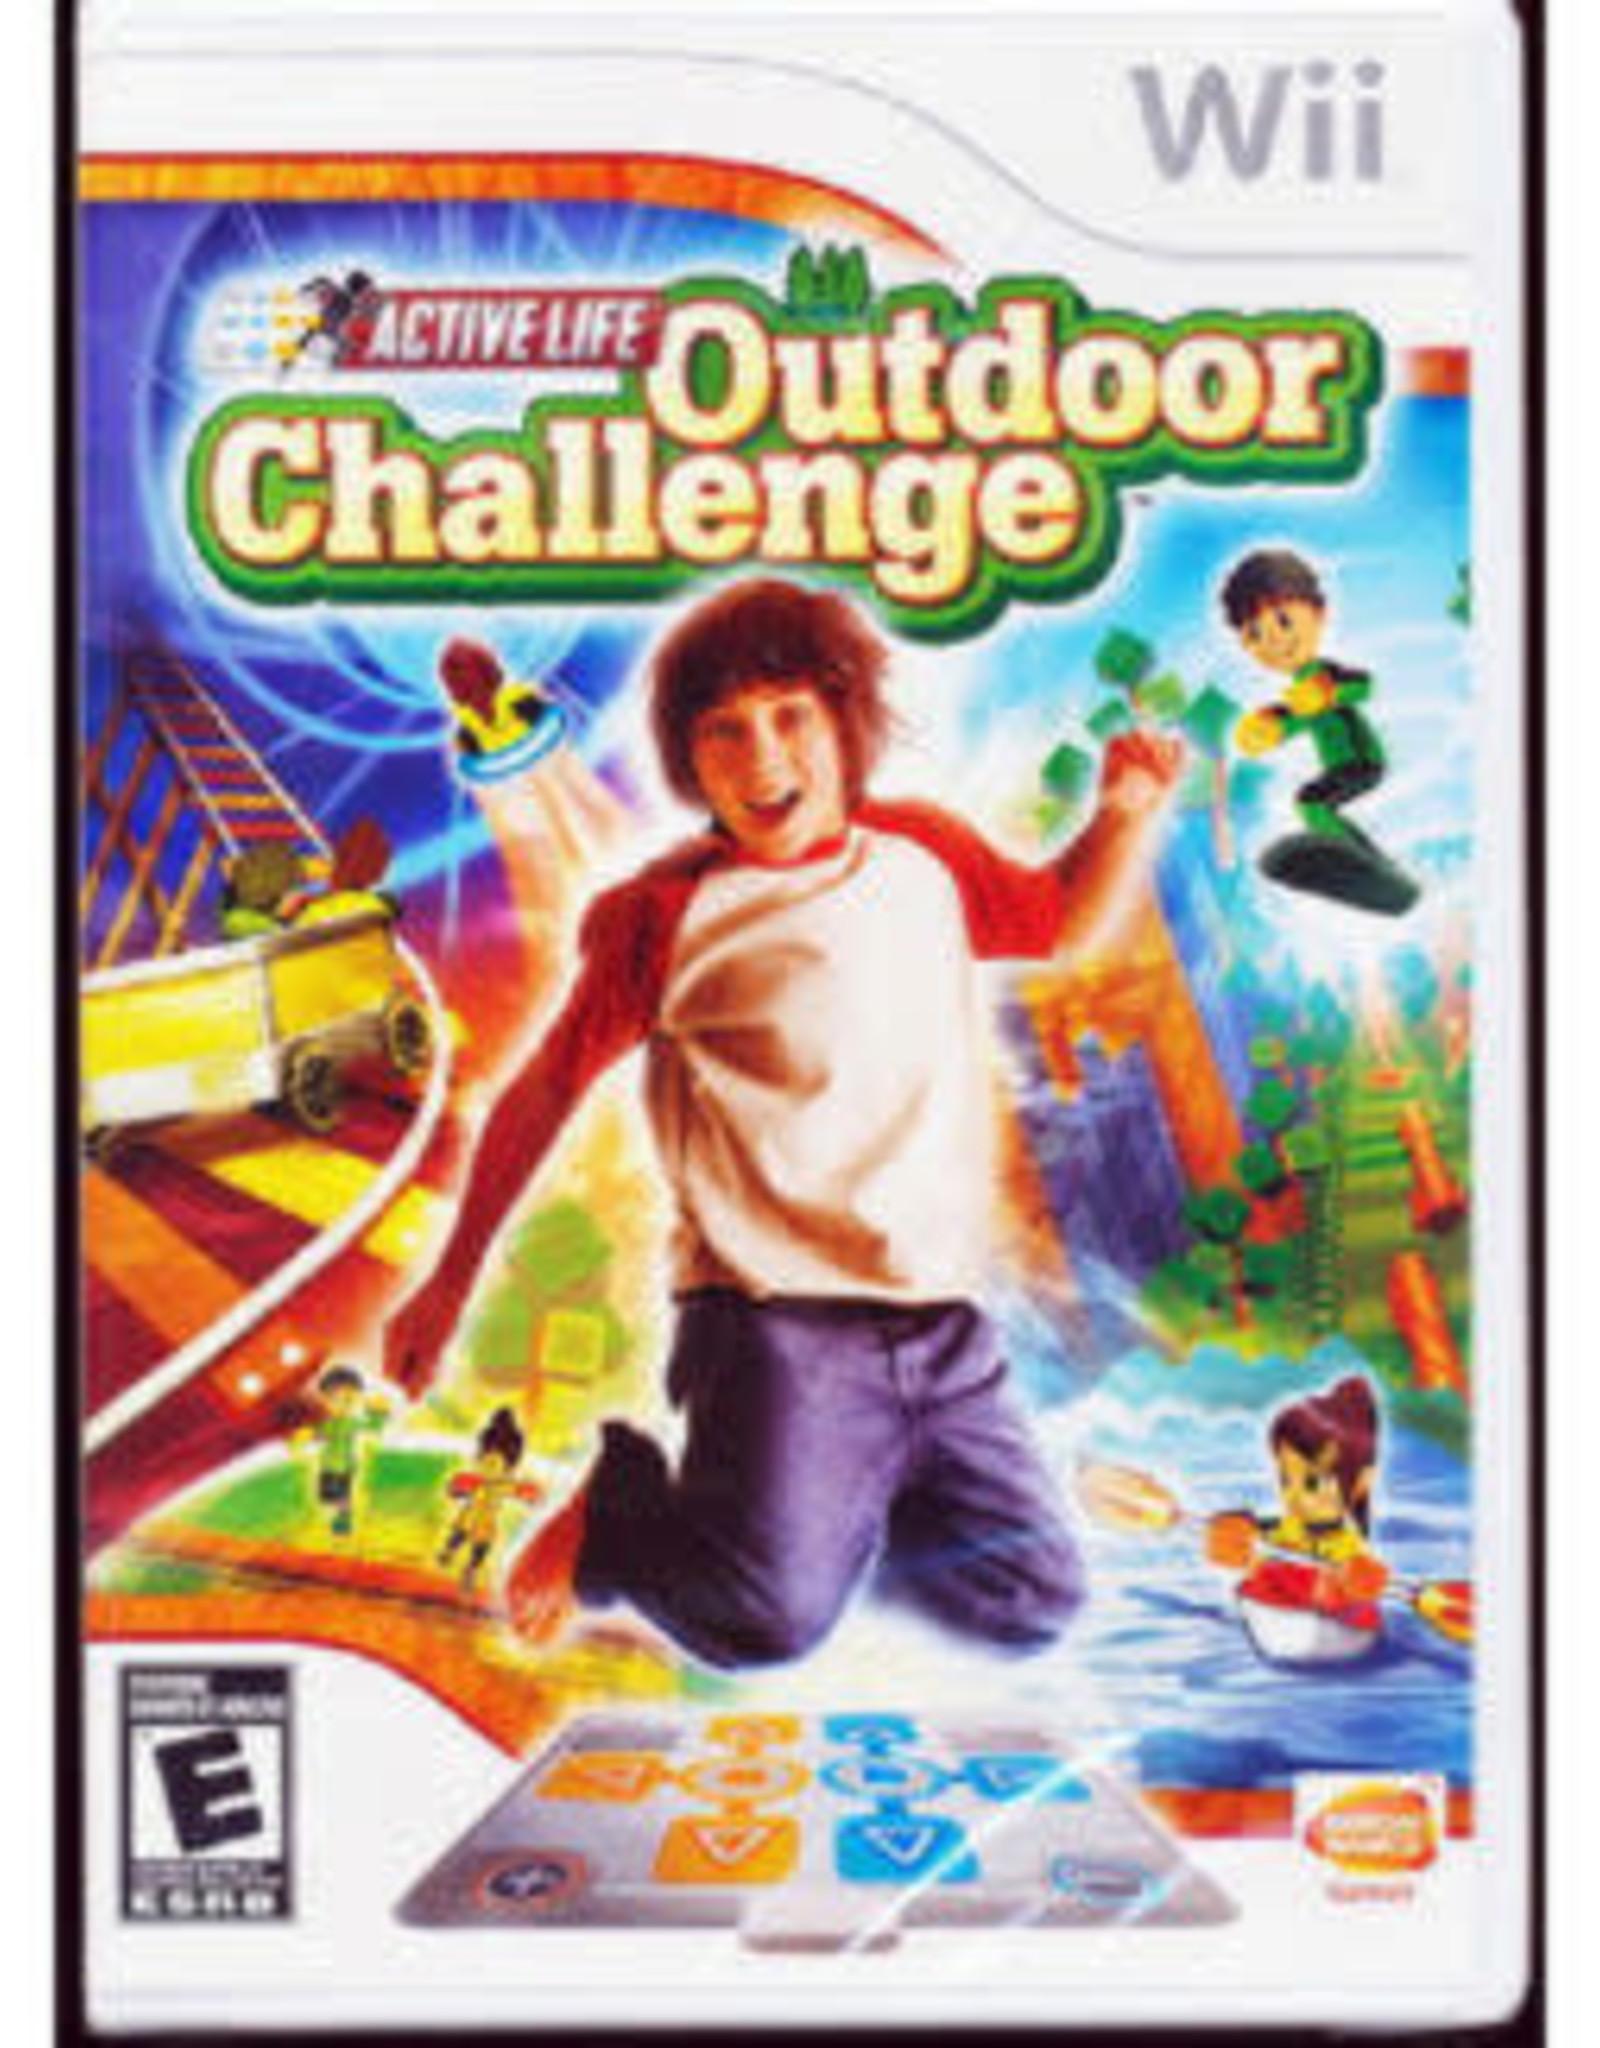 Wii Active Life Outdoor Challenge *Active Life Mat Required*